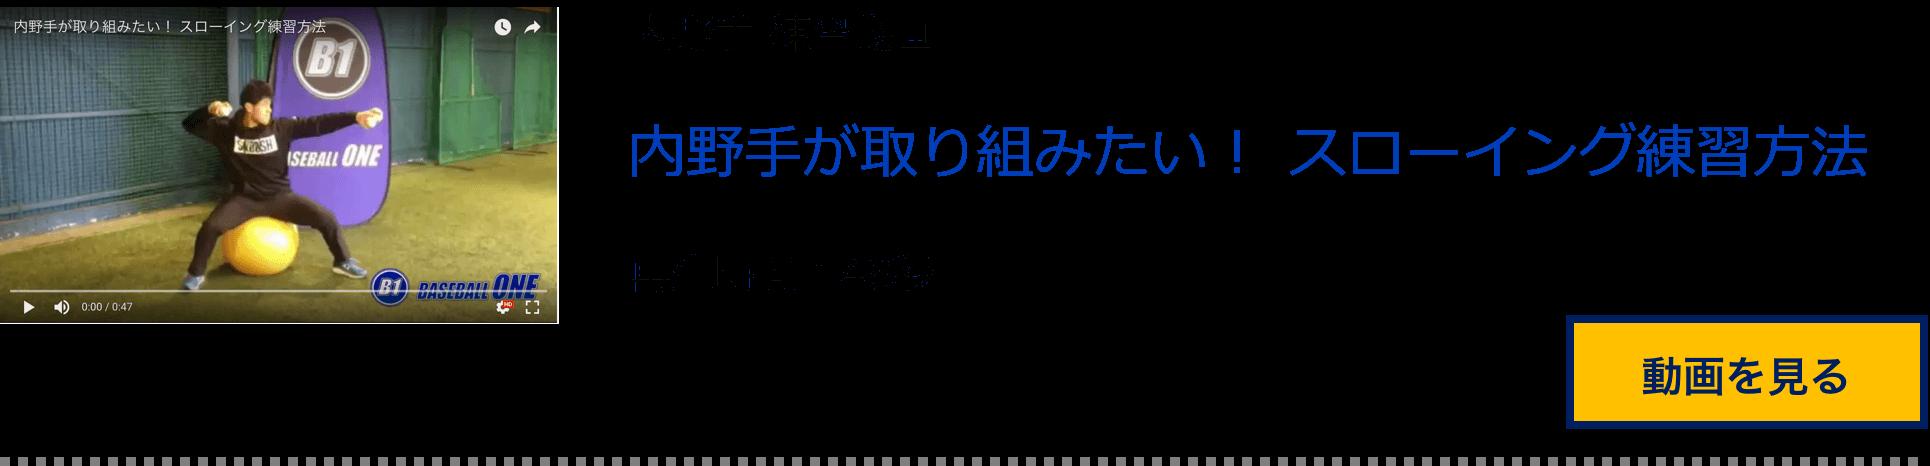 n11 (1)